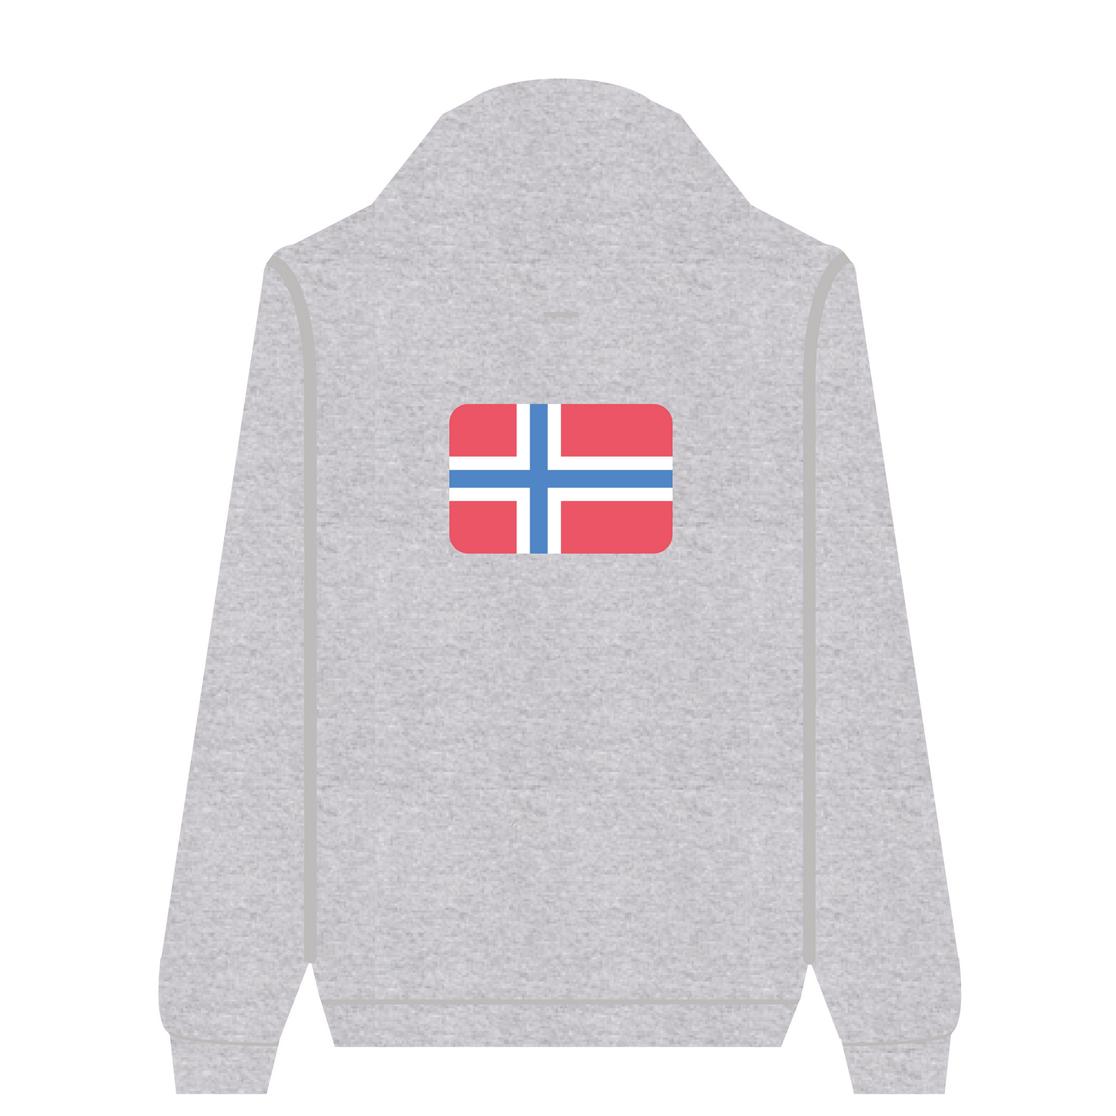 Full Zip Hoodie Norway | Wuzzee